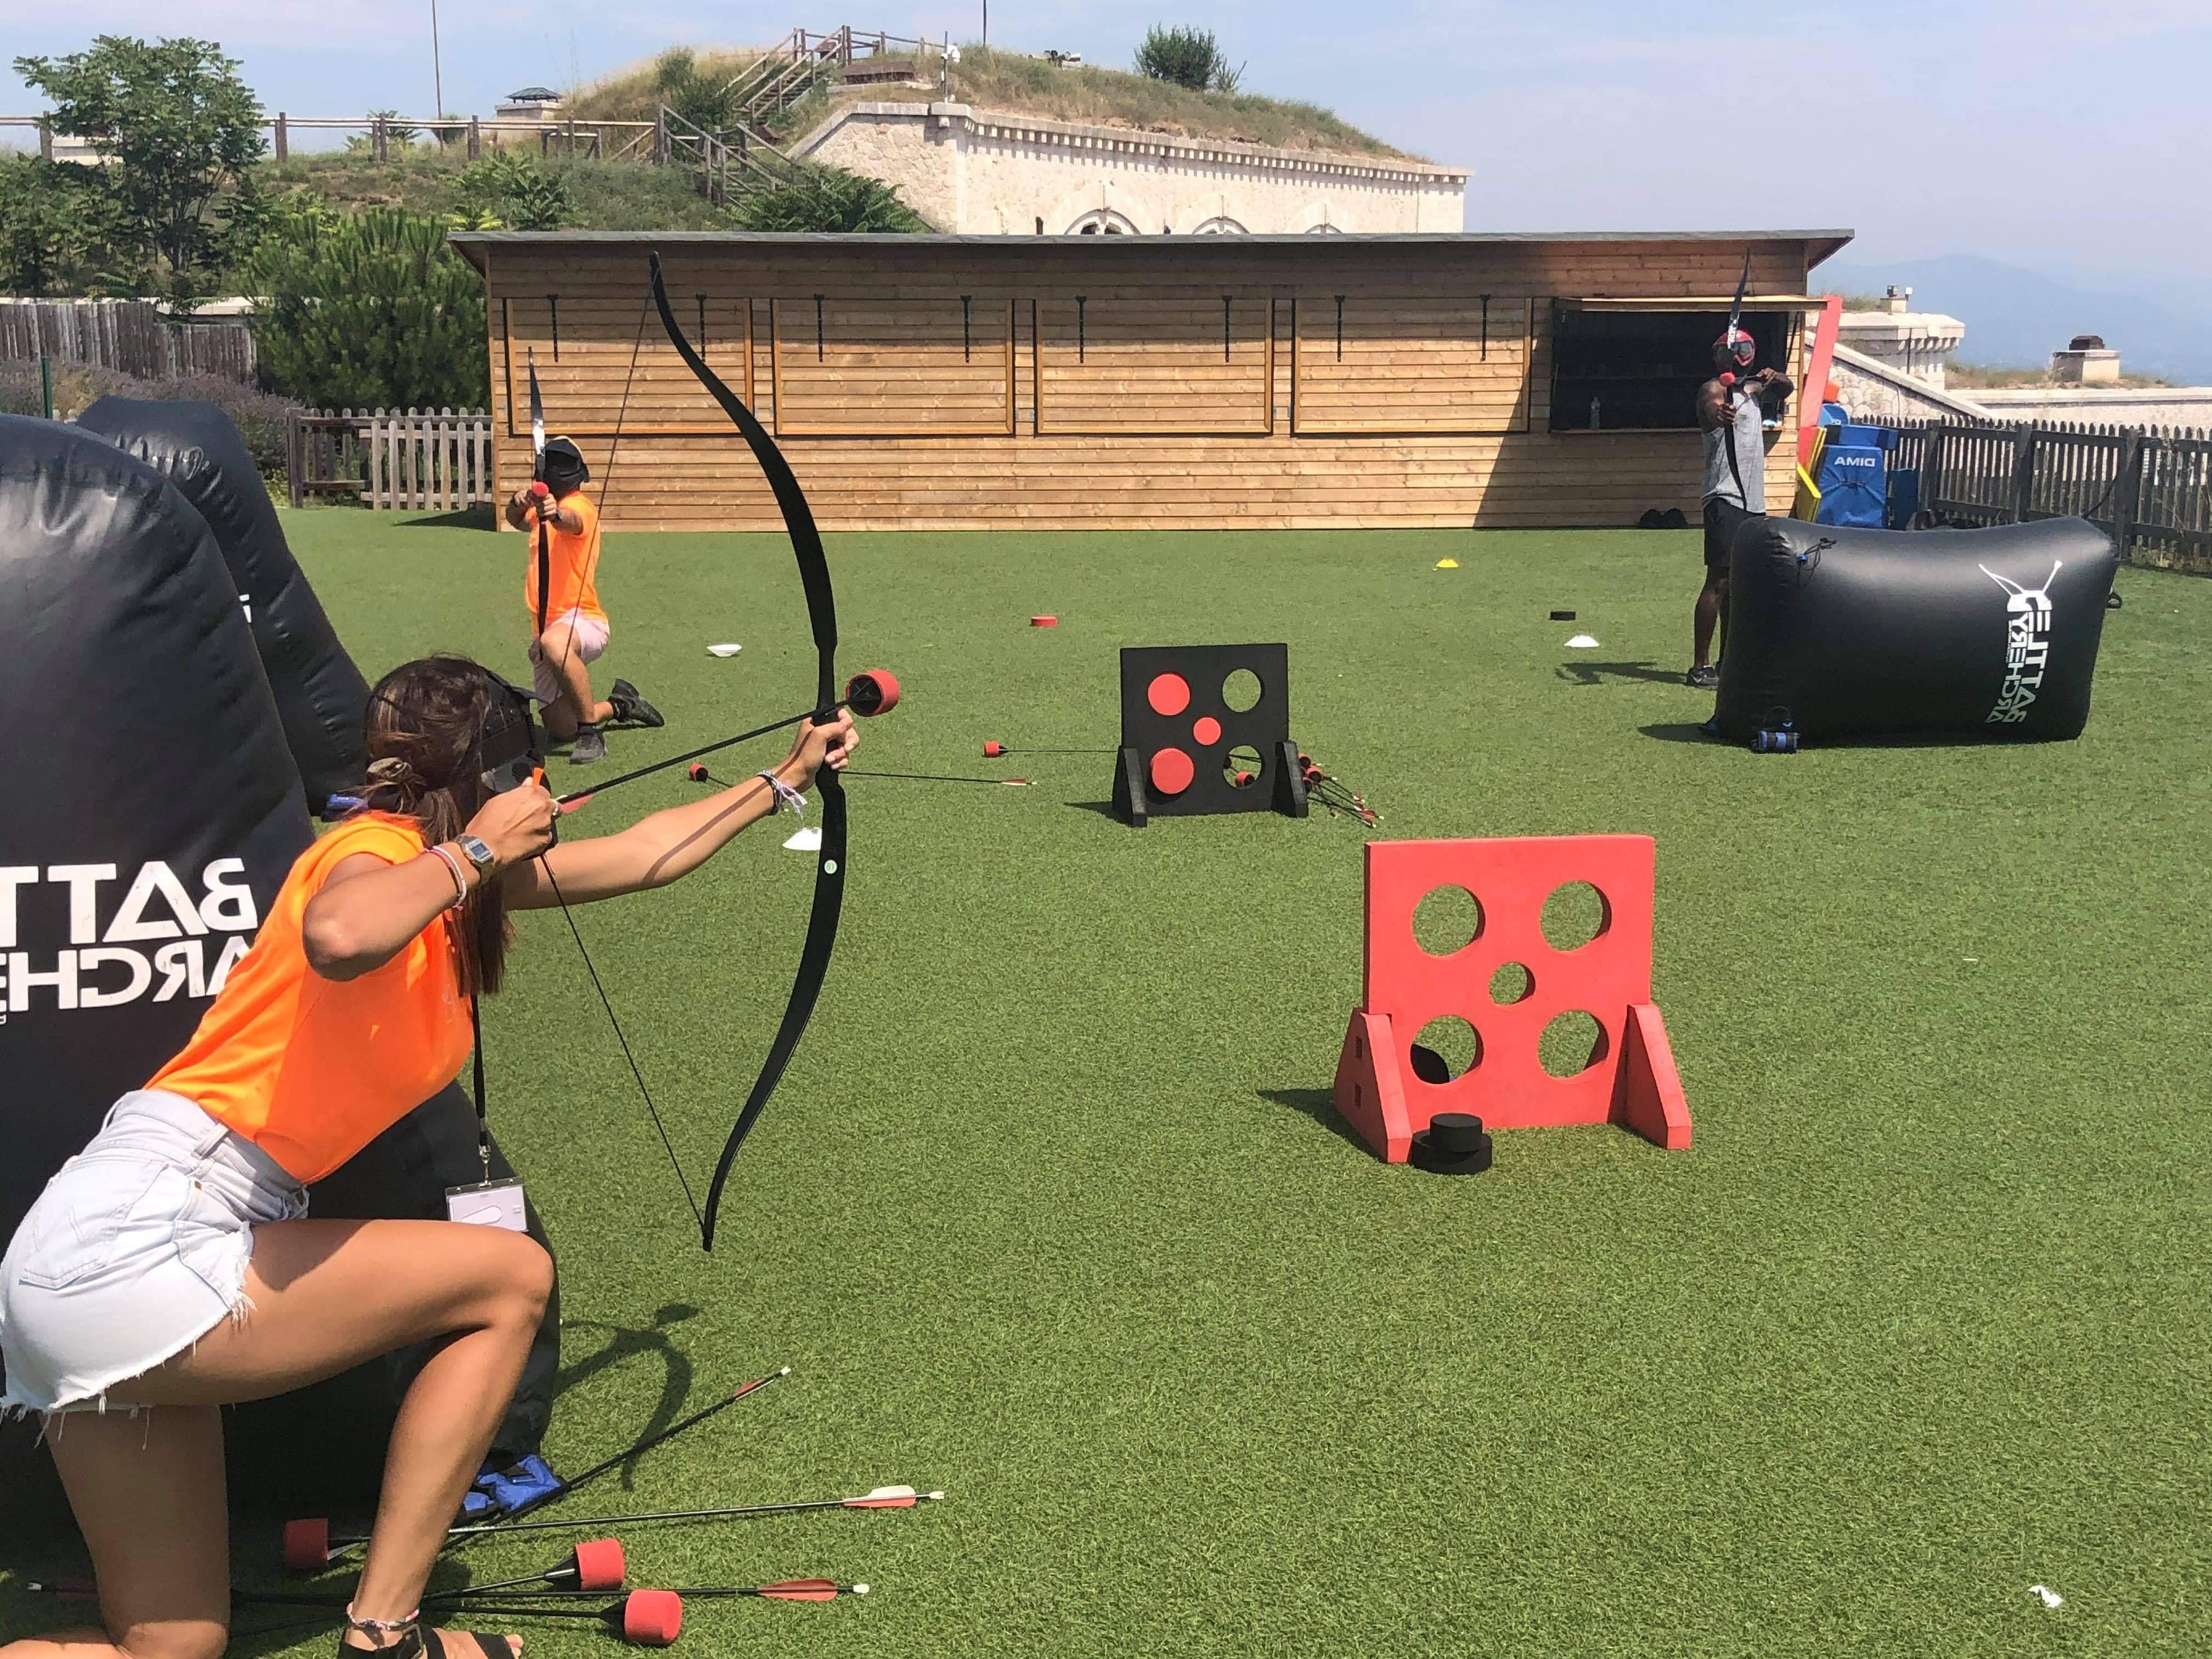 terrain de jeu d'archery tag avec personnes se tirant dessus